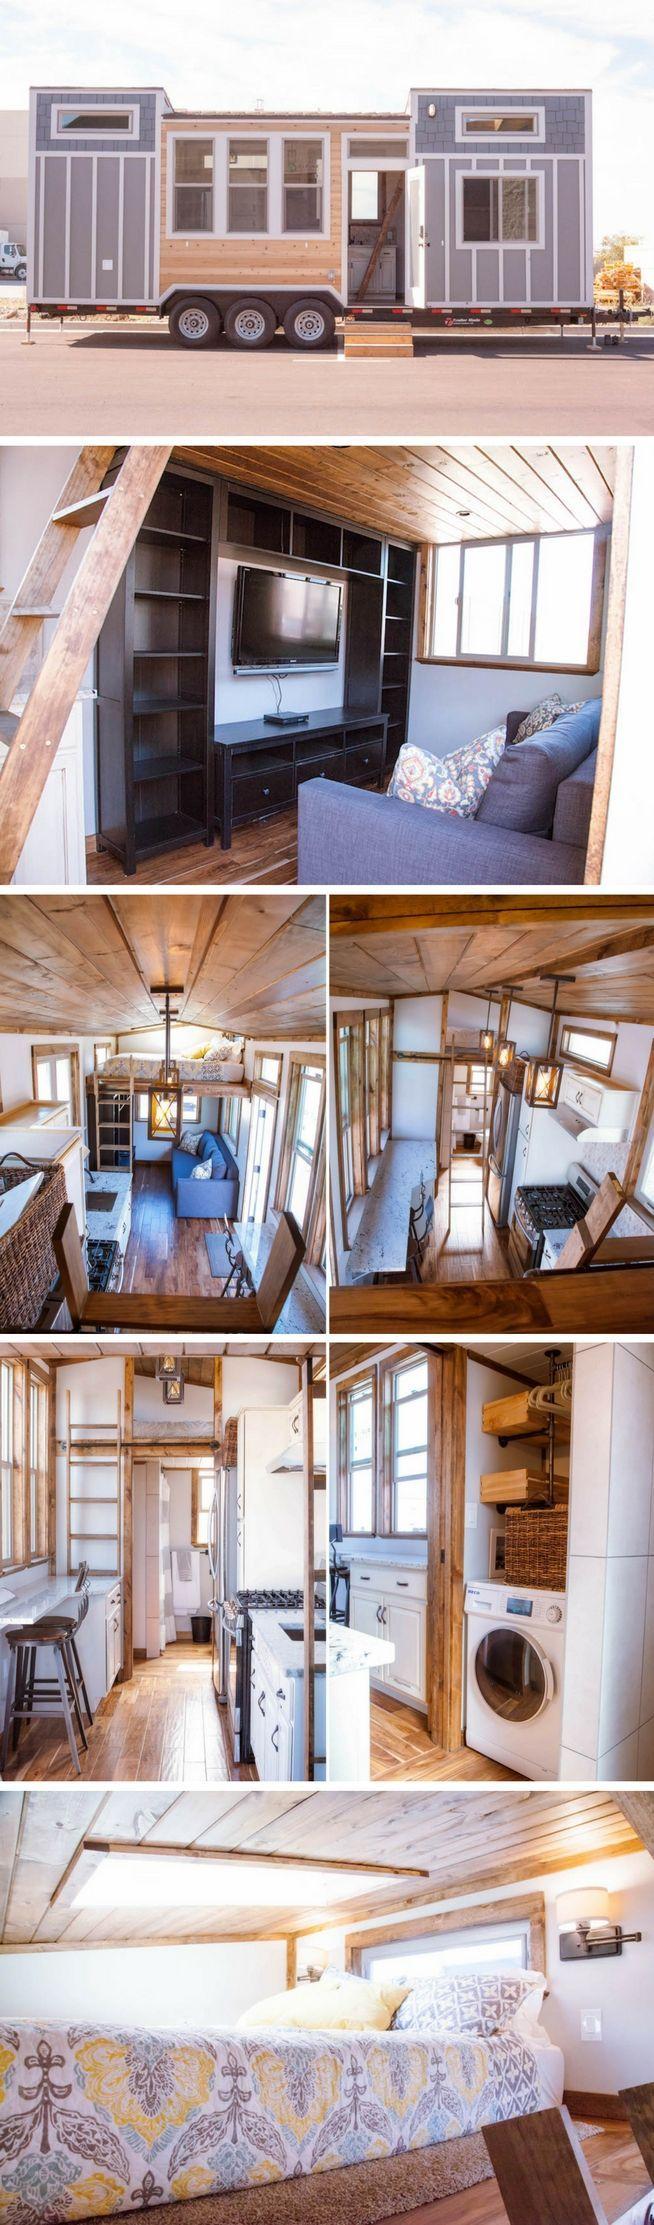 awesome The Teton tiny house by Alpine Tiny Homes... by http://www.danaz-homedecor.xyz/tiny-homes/the-teton-tiny-house-by-alpine-tiny-homes/